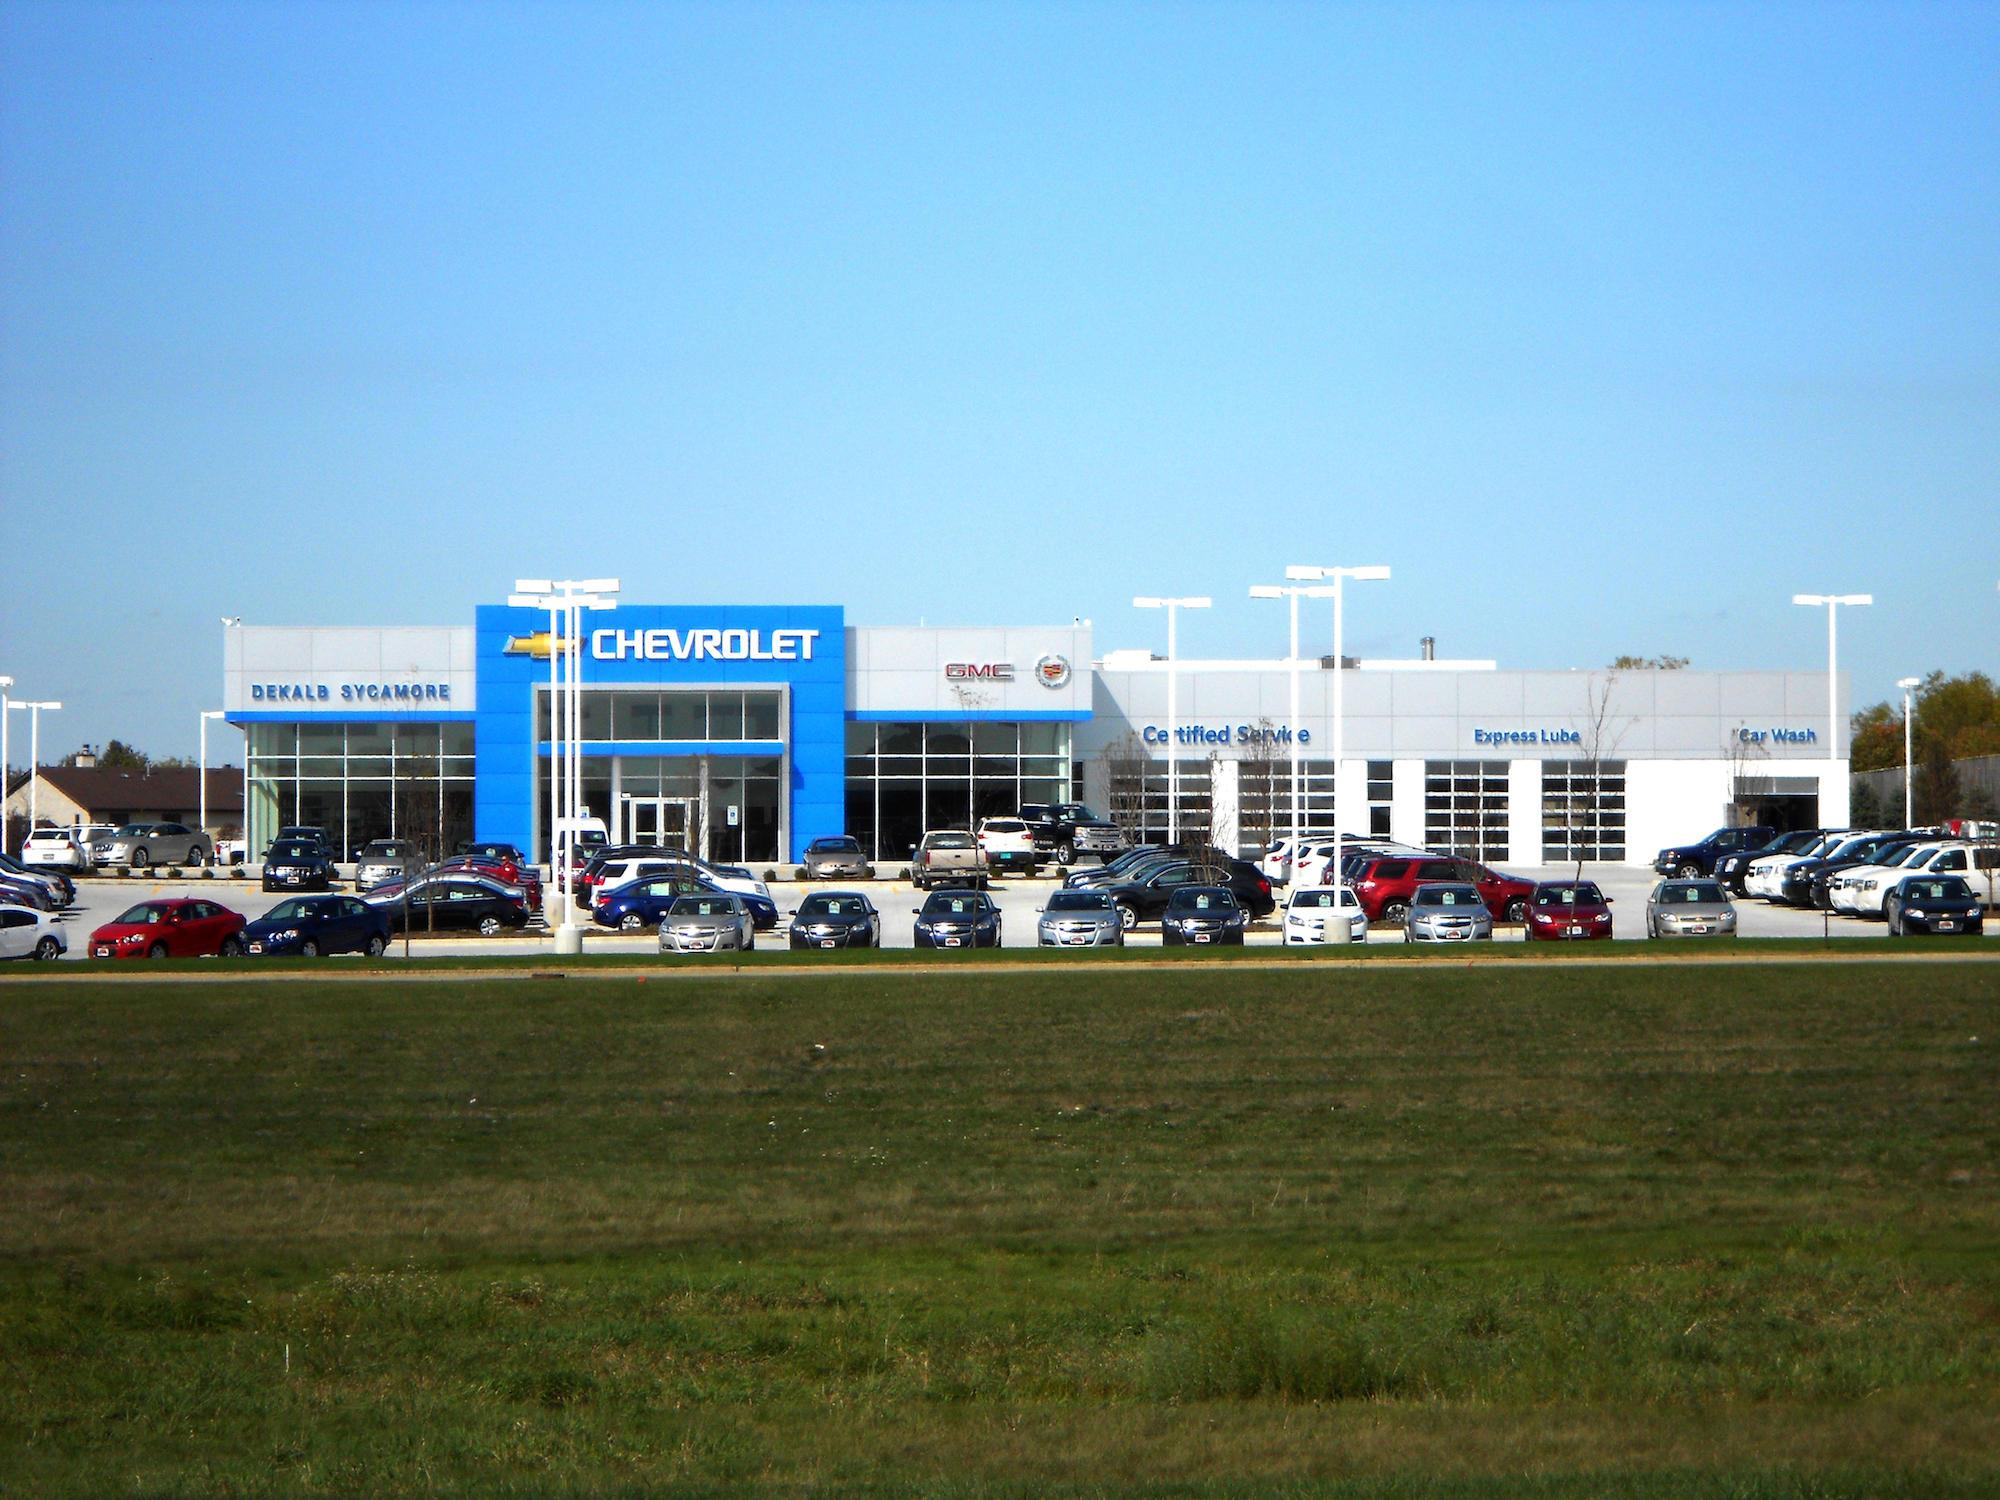 DeKalb Sycamore Chevrolet GMC image 0